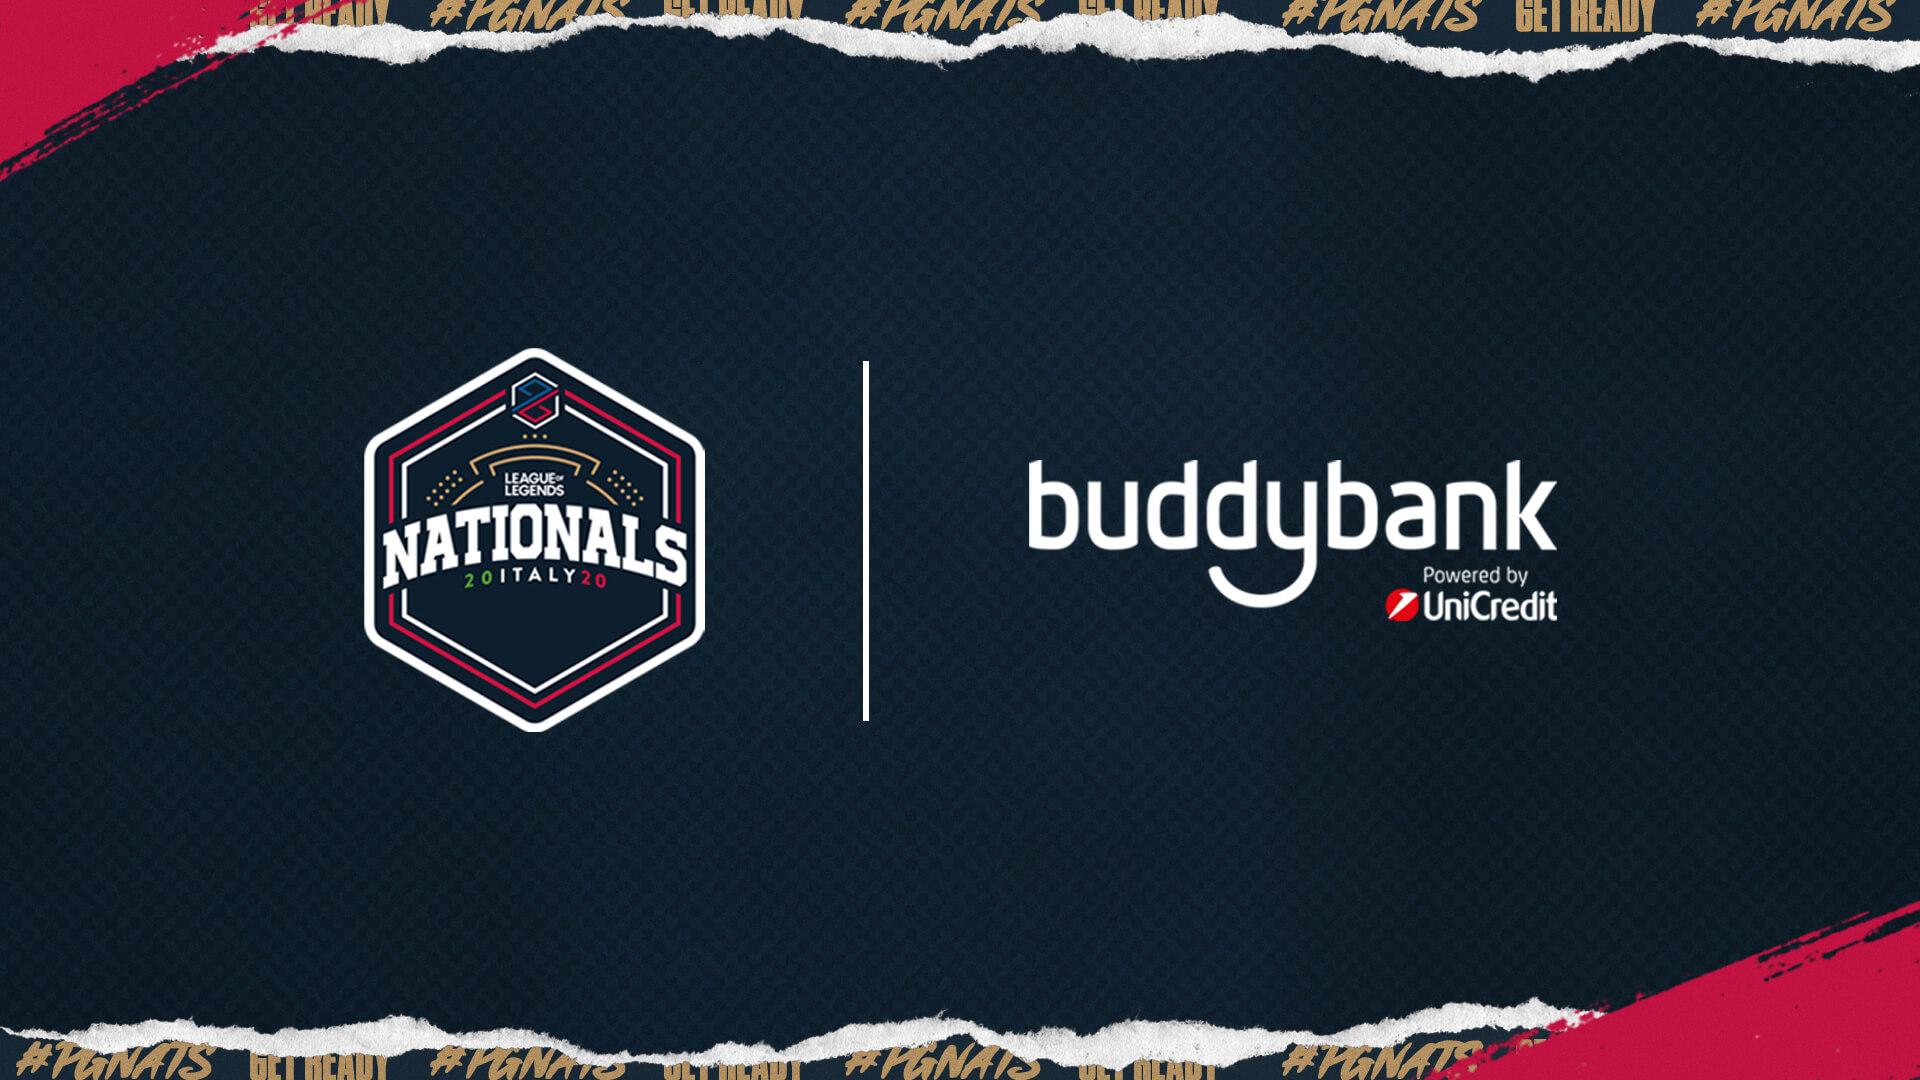 PG Nationals Summer Split: l'edizione 2020 è powered by buddybank thumbnail